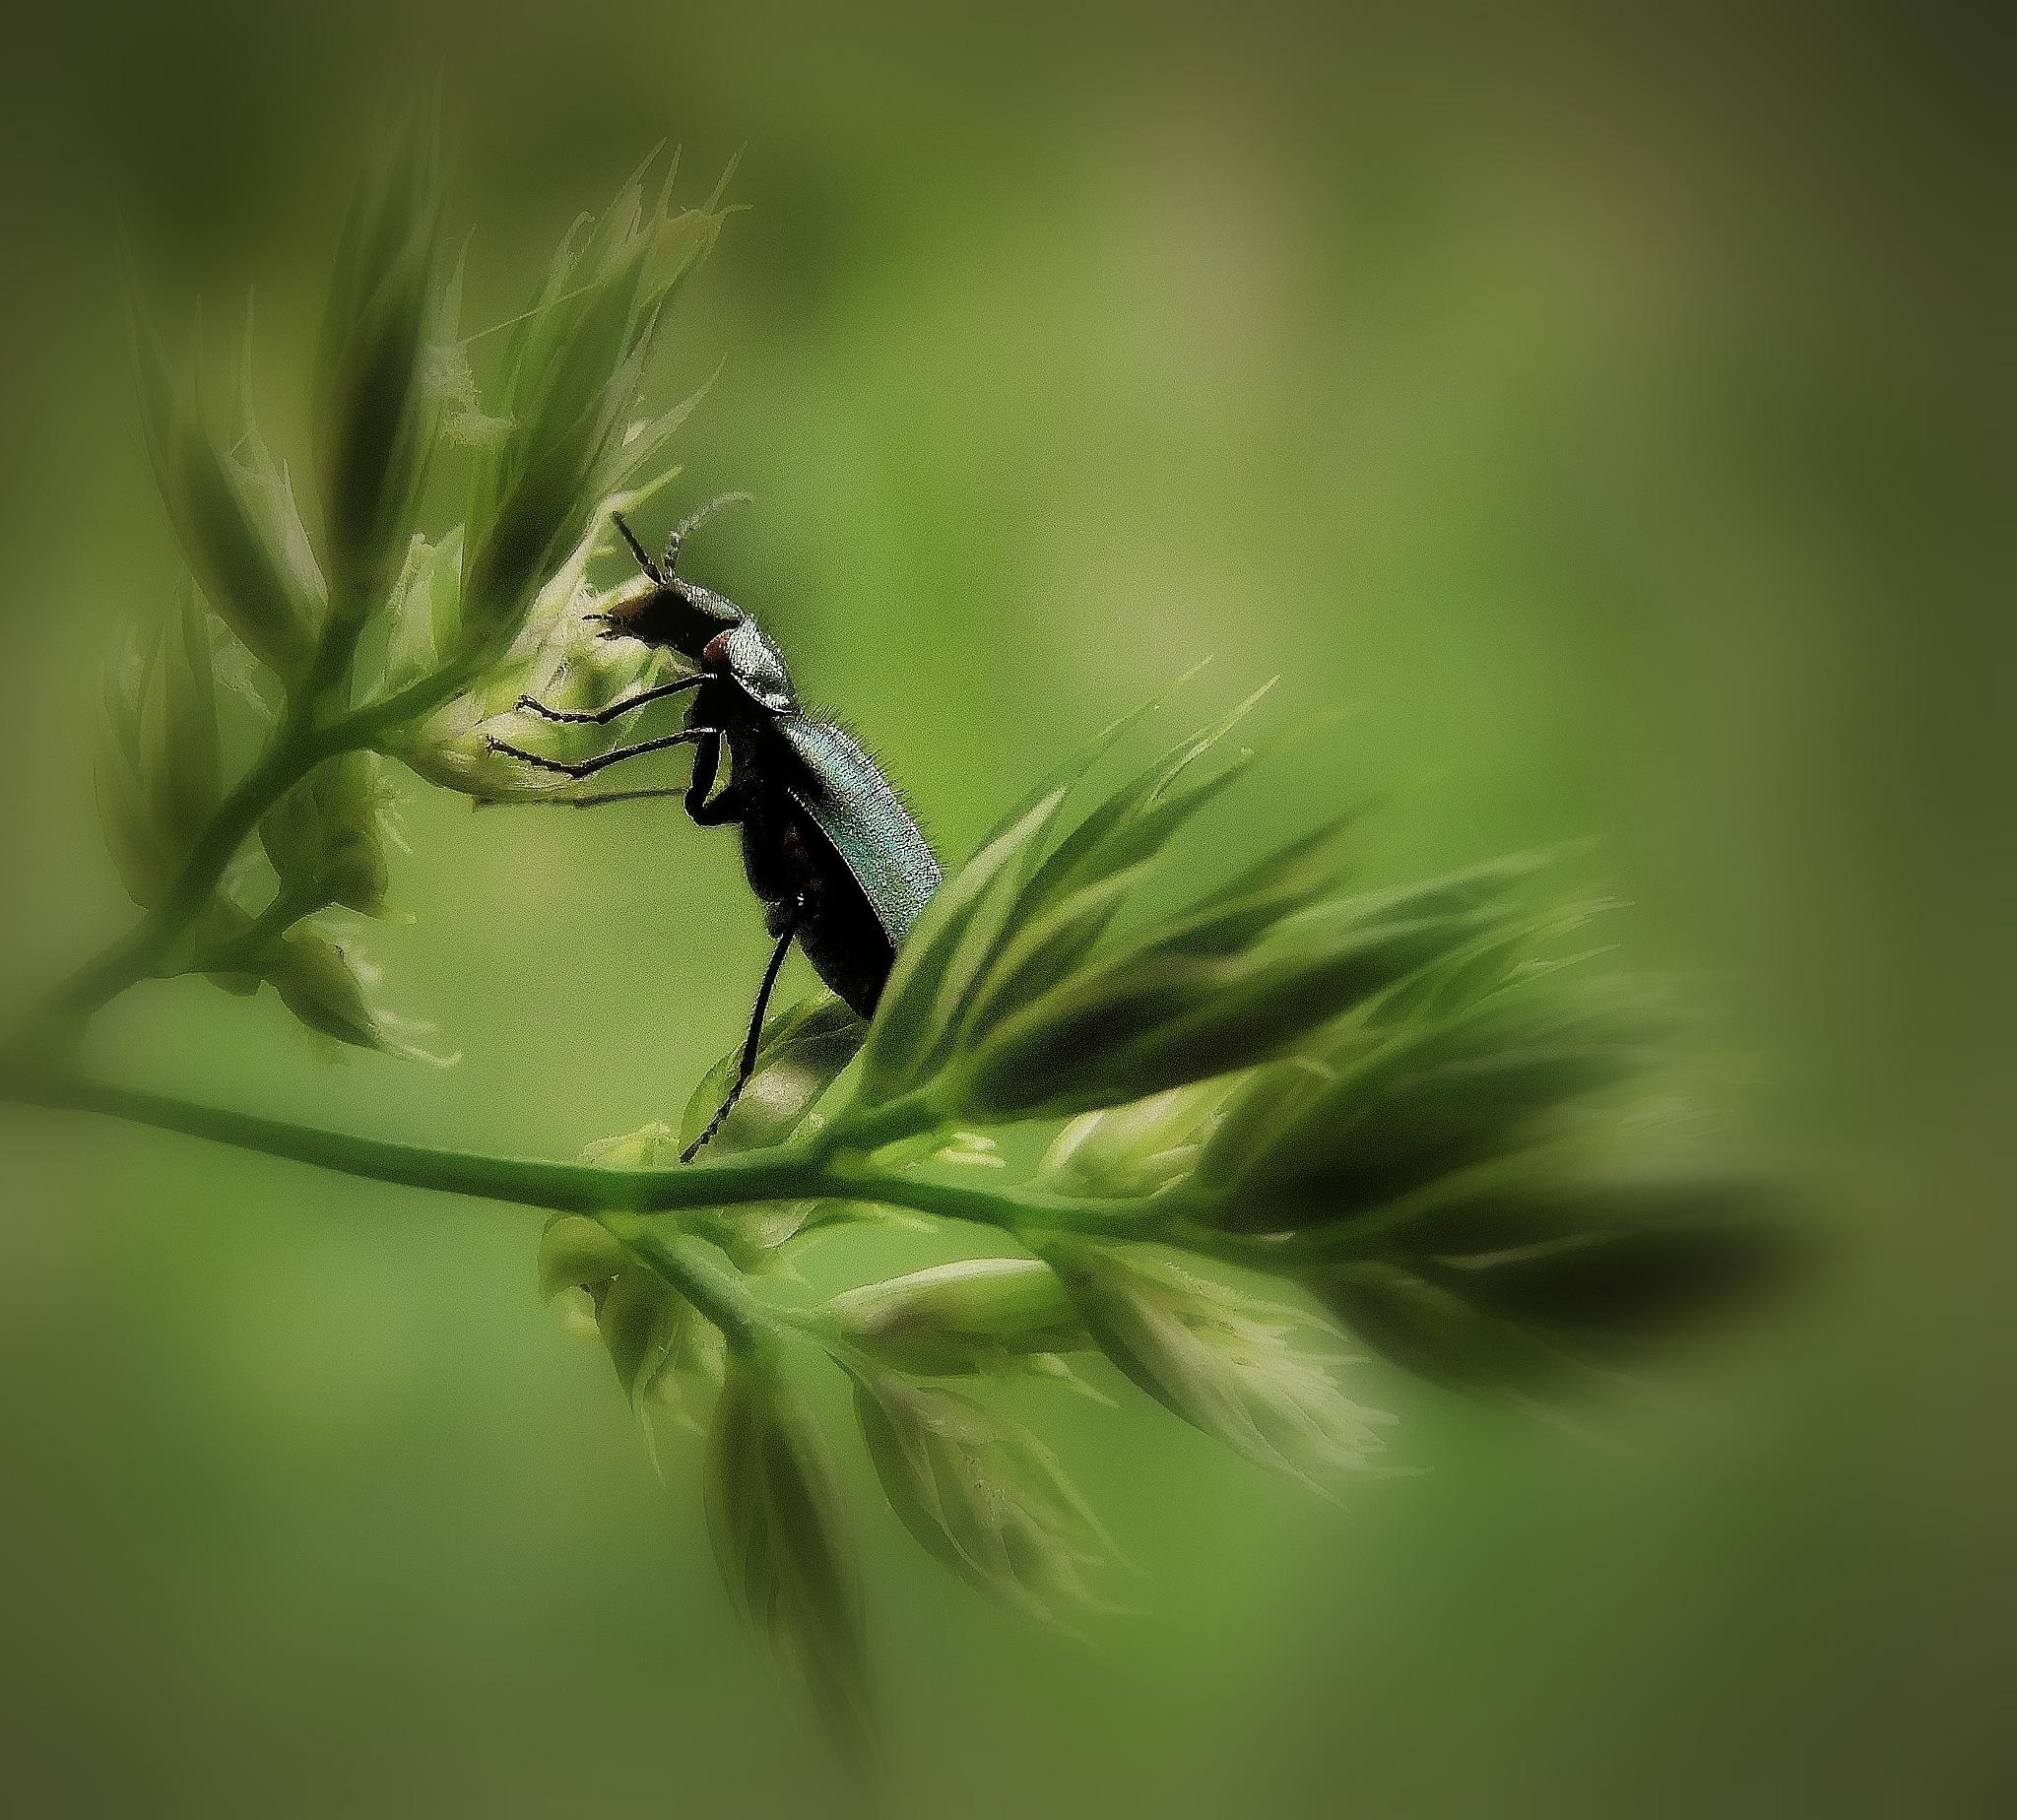 curious beetle        by johan.vandergouw